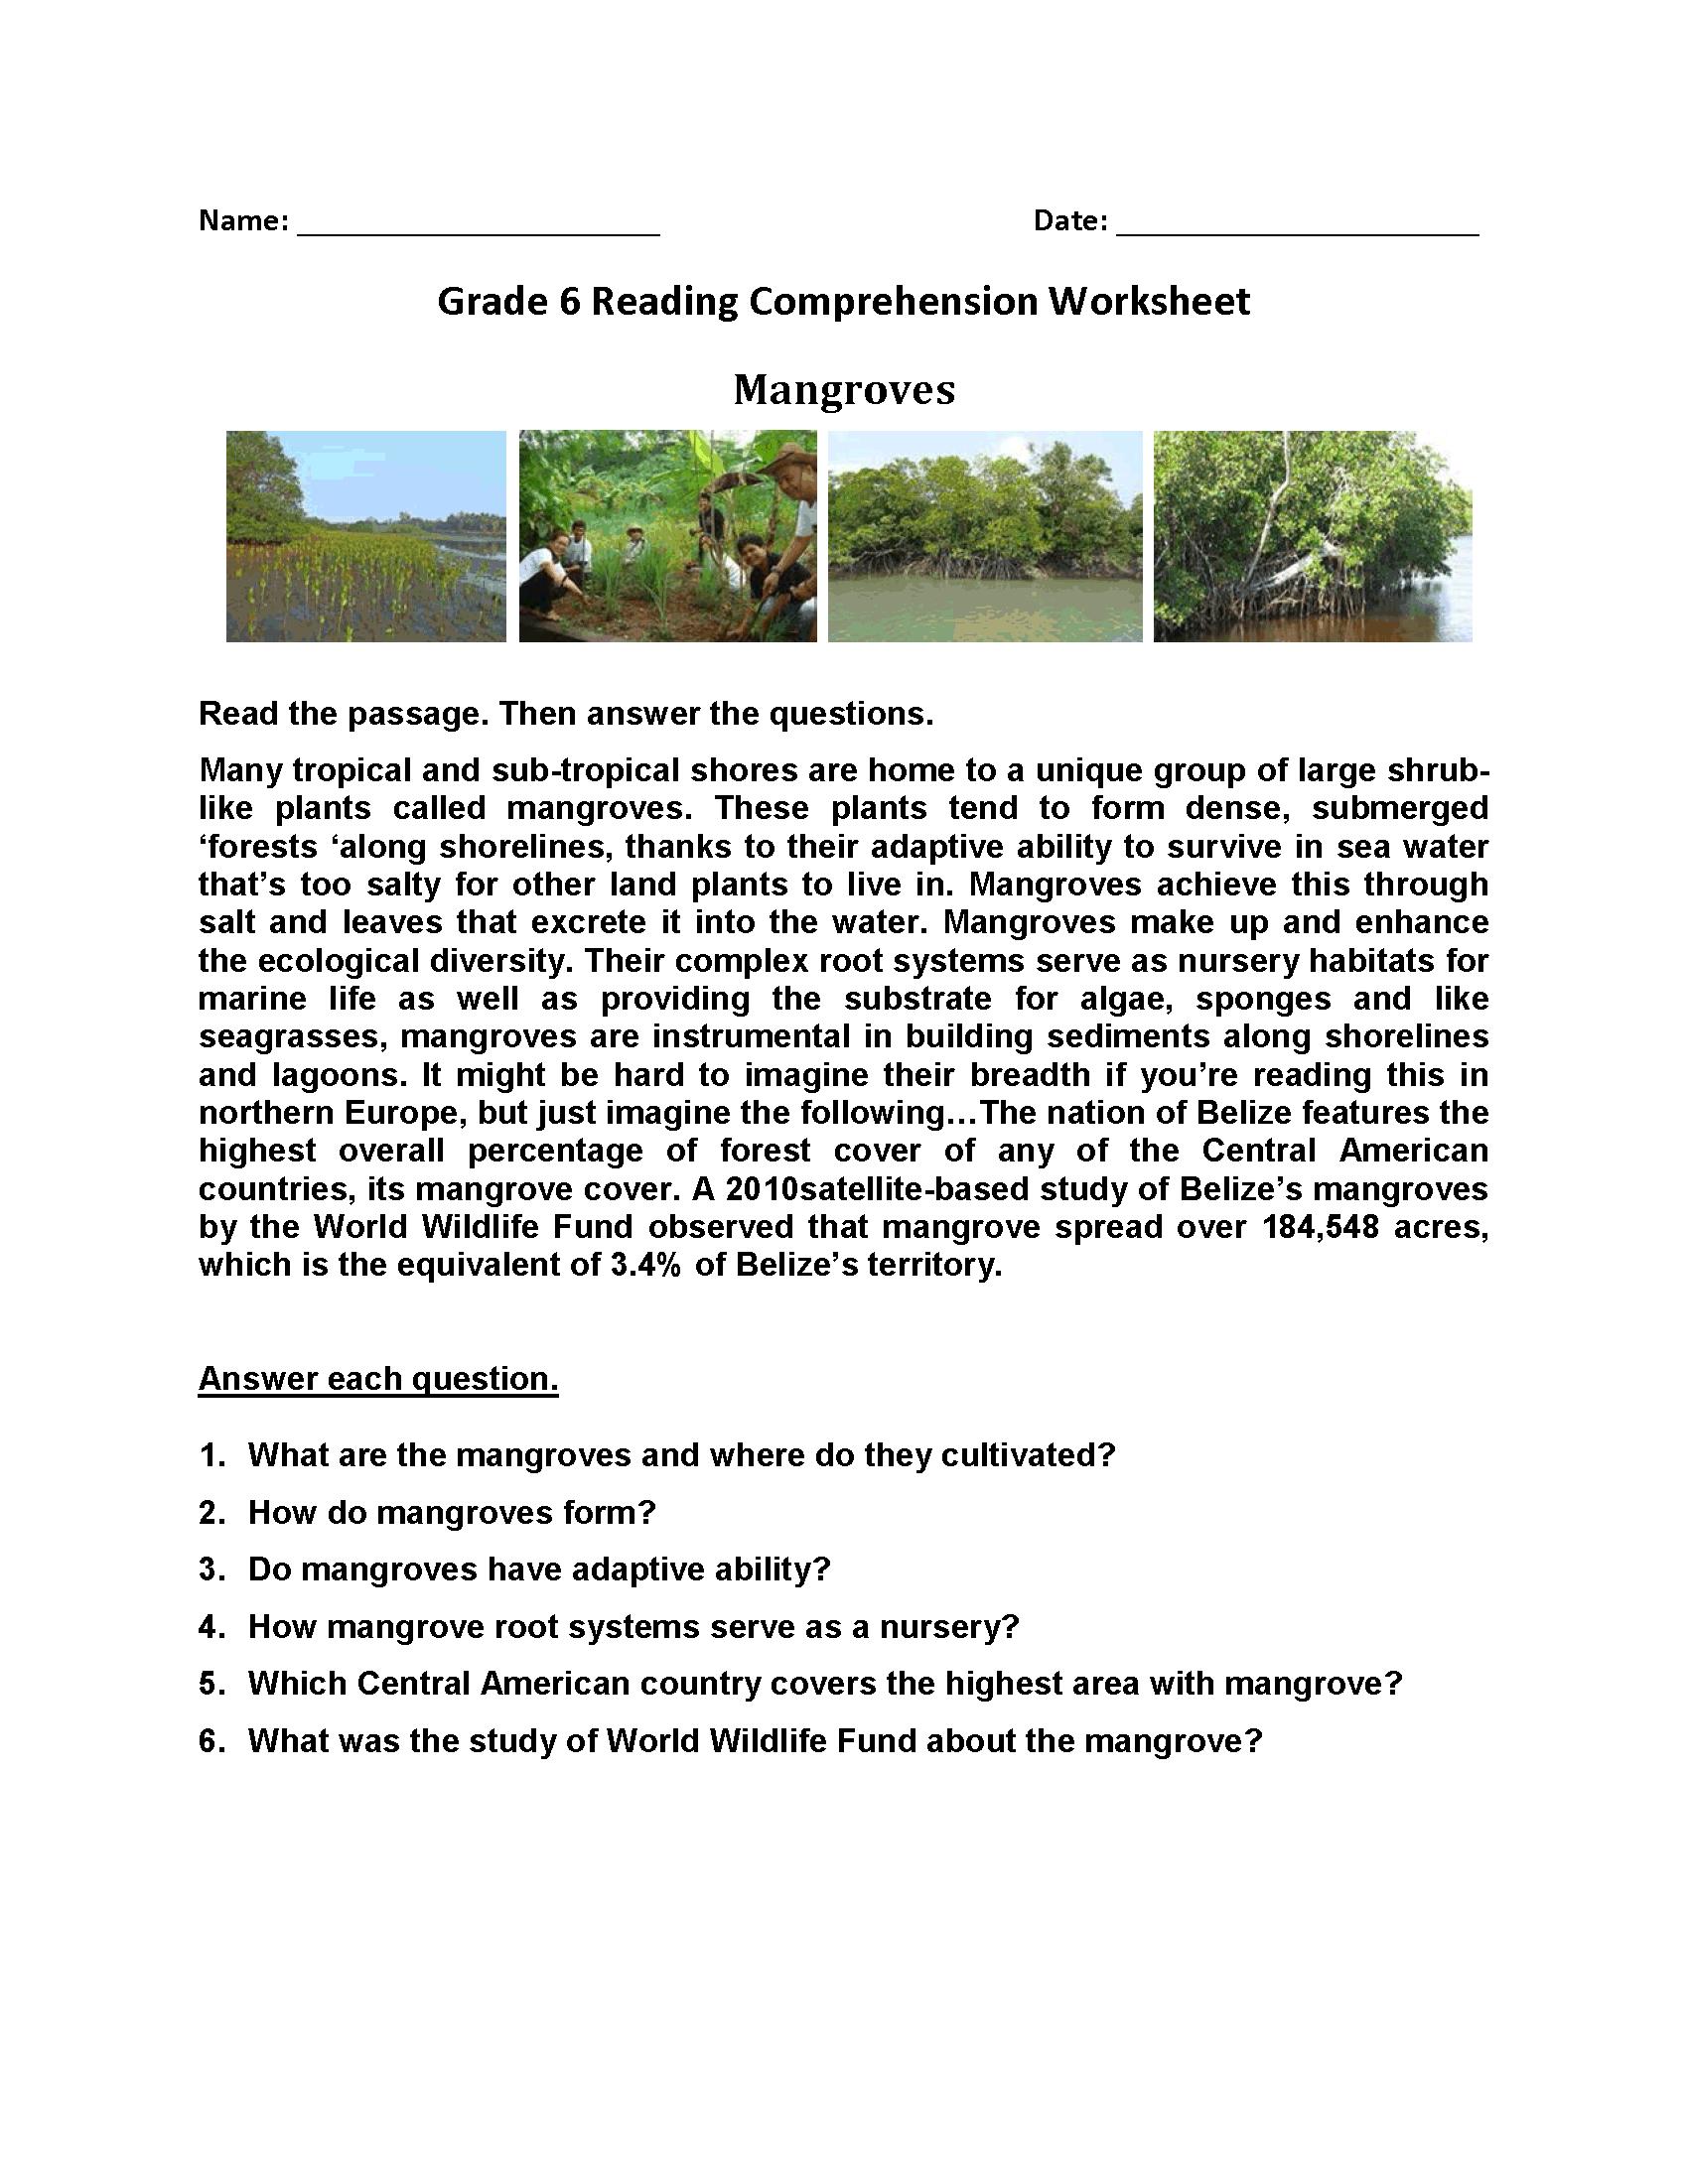 Mangroves Reading Comprehension 6th Grade